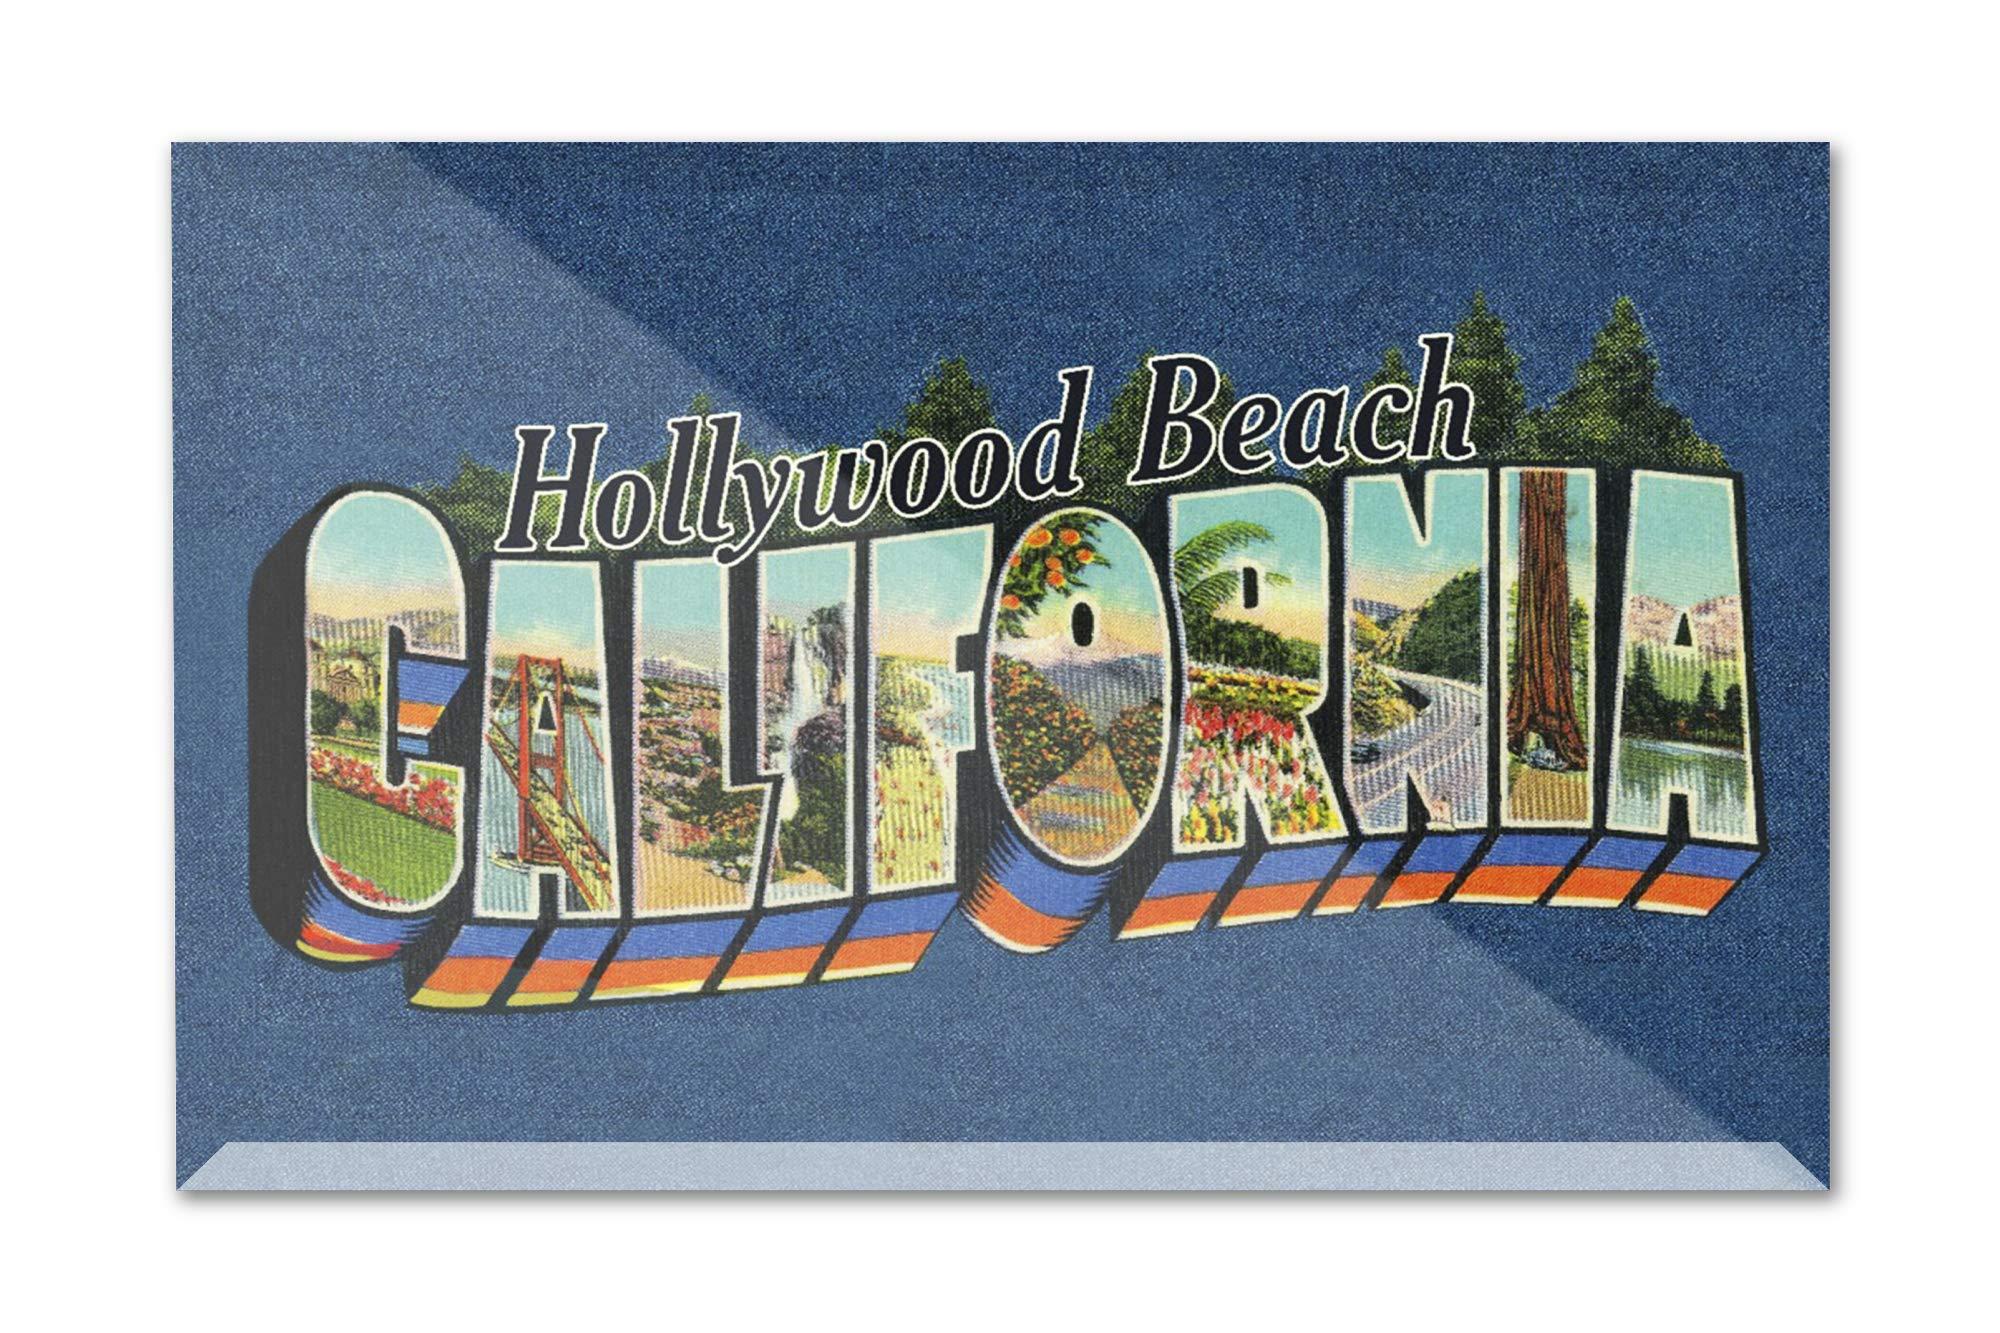 Hollywood Beach, California - Greetings - Contour - Vintage Postcard 99625 (9x6 Acrylic Photo Block Gallery Quality)